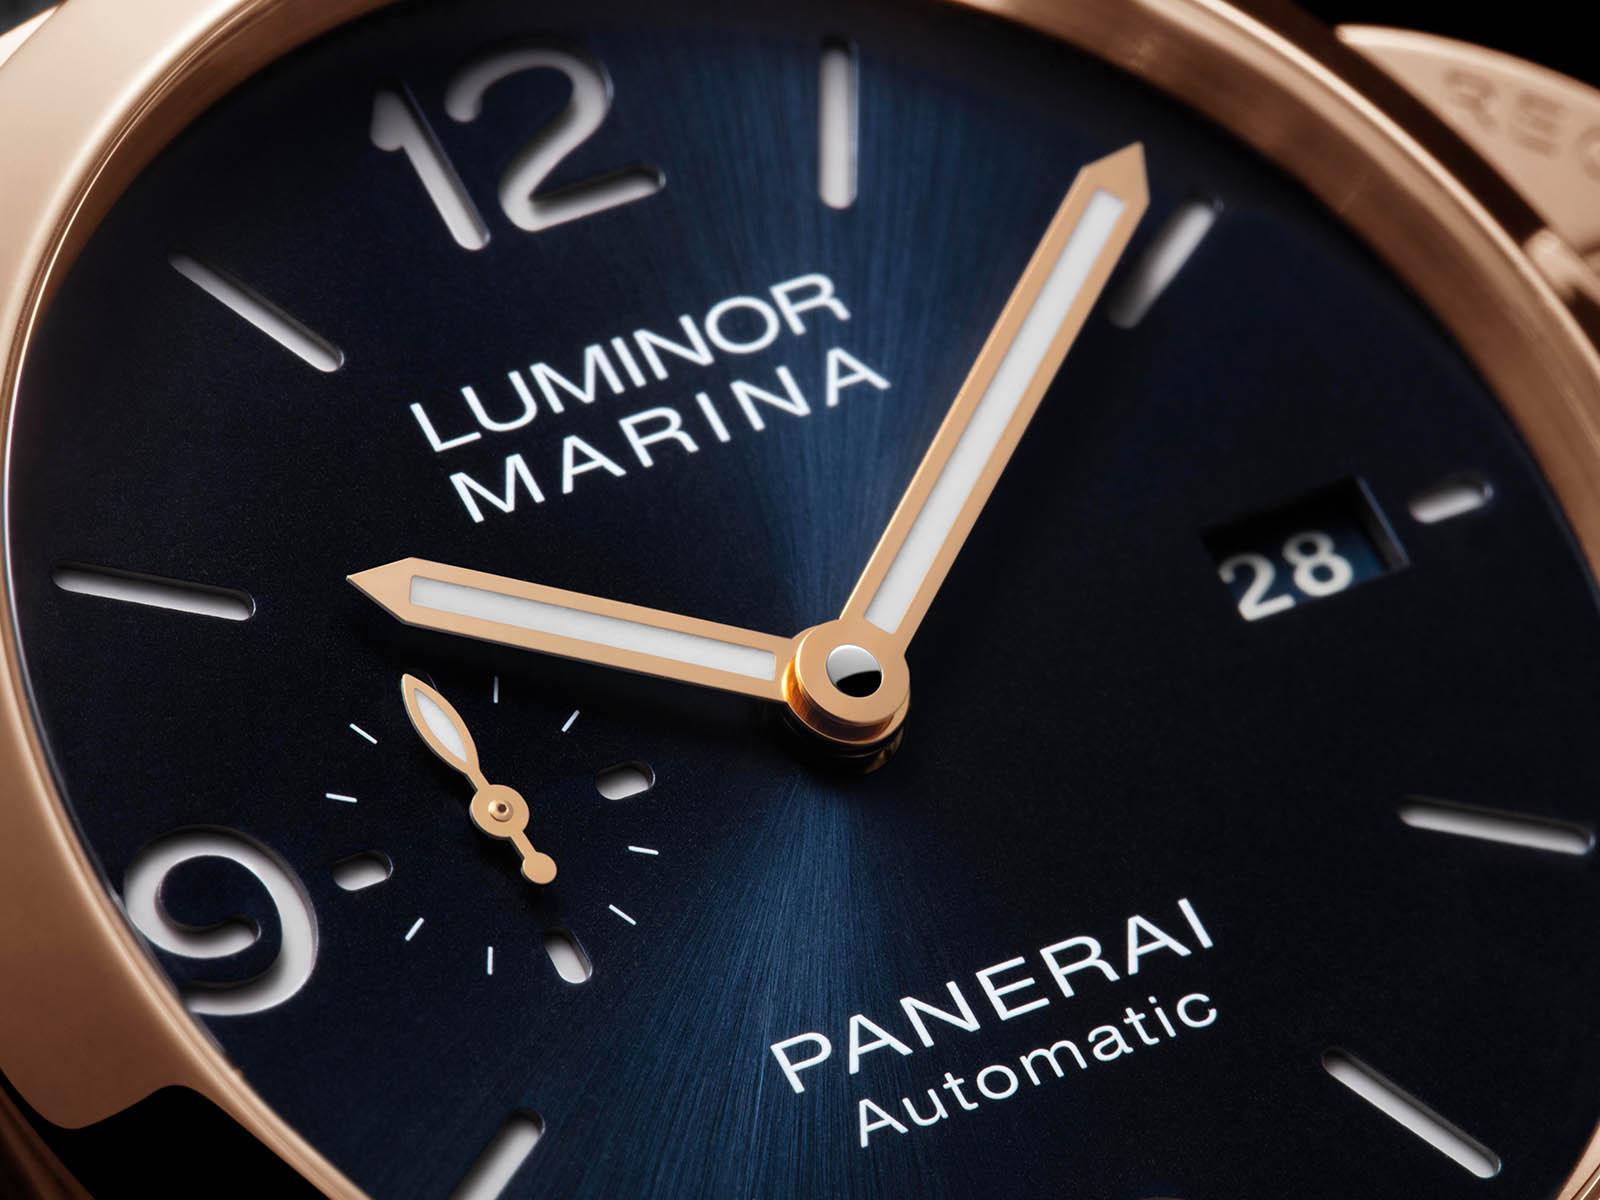 pam01112-officine-panerai-luminor-marina-panerai-goldtech-44mm-3.jpg